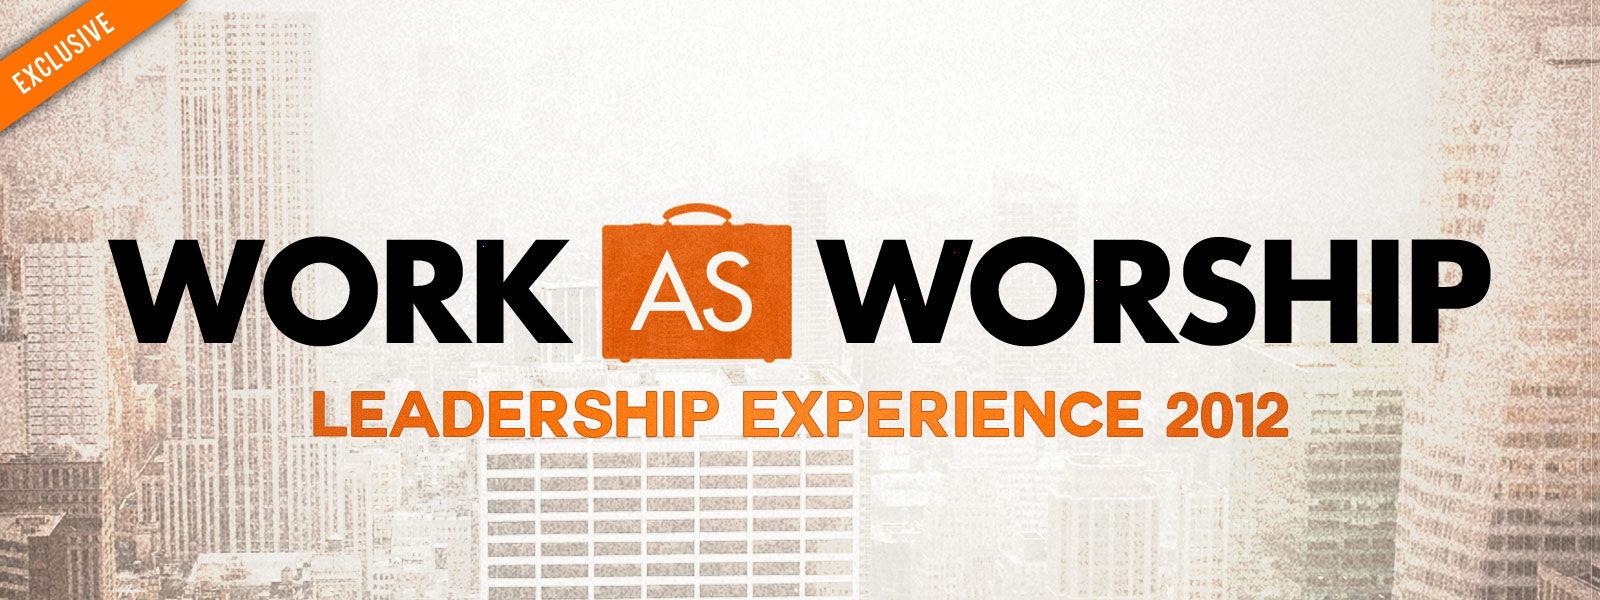 Work as Worship 2012 Leadership Experience